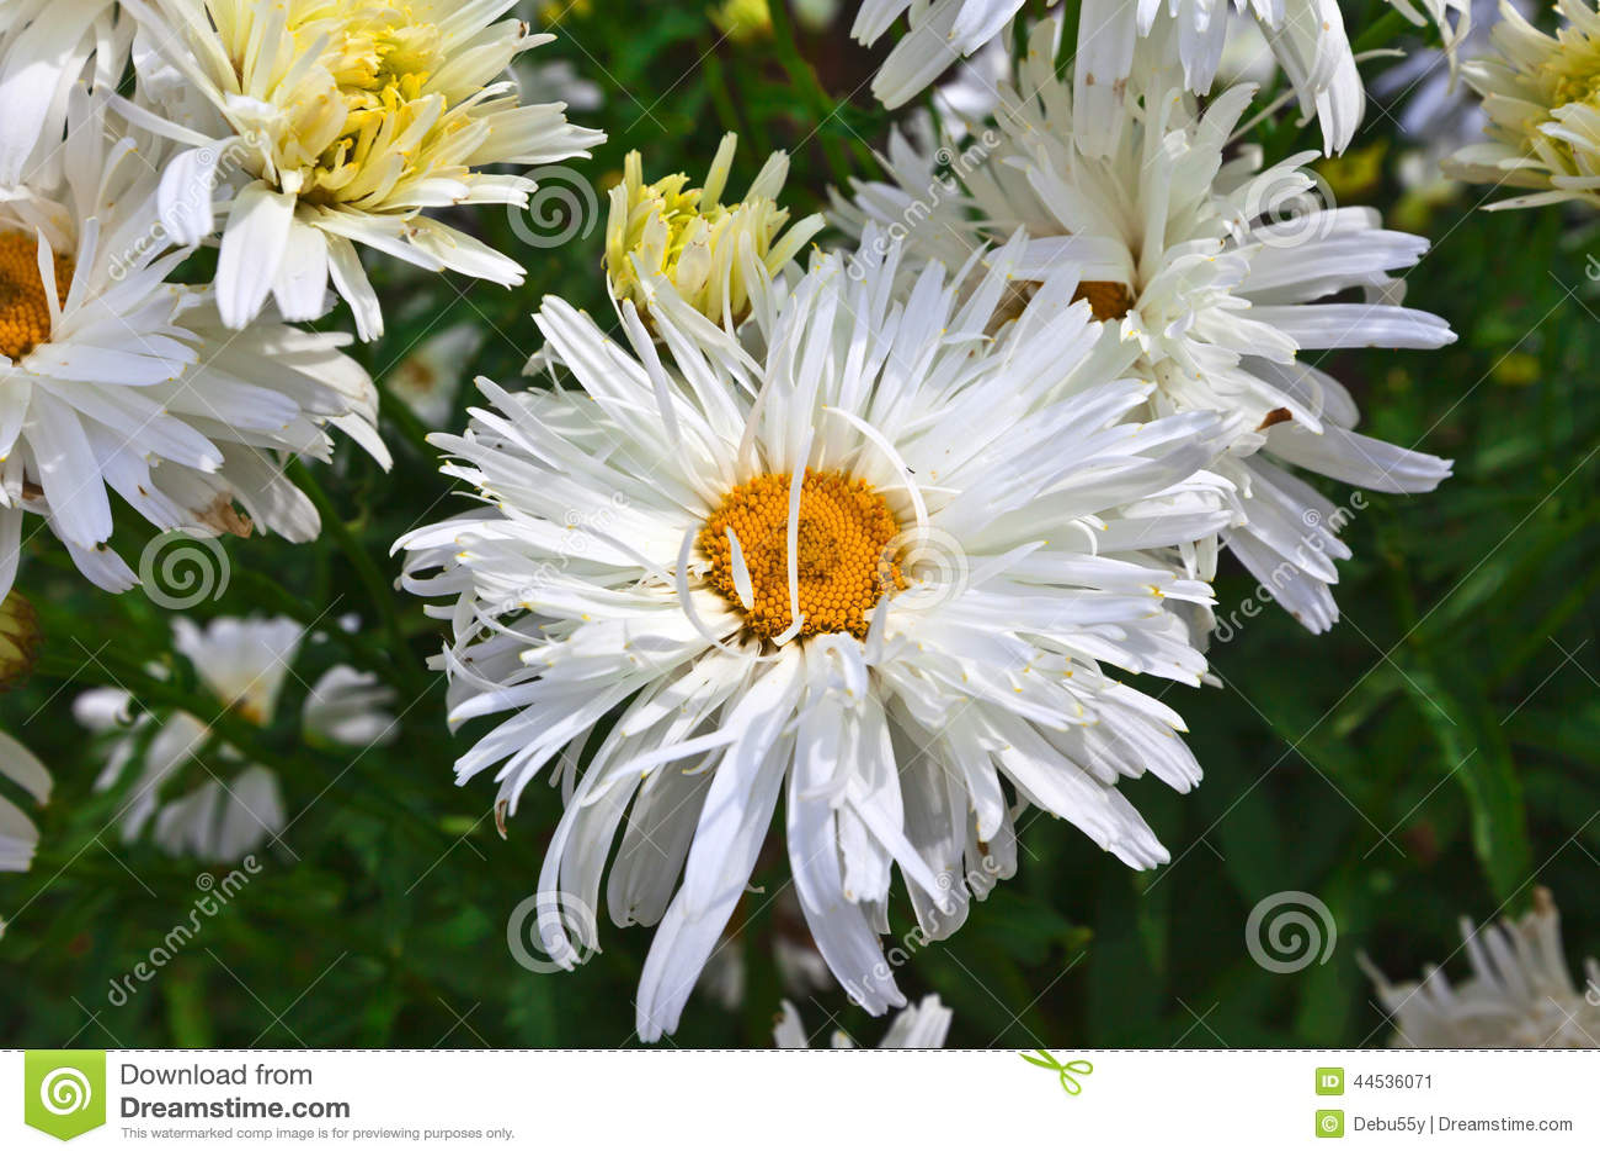 Double petal daisy stock image image of natural flower 44536071 double petal daisy izmirmasajfo Image collections